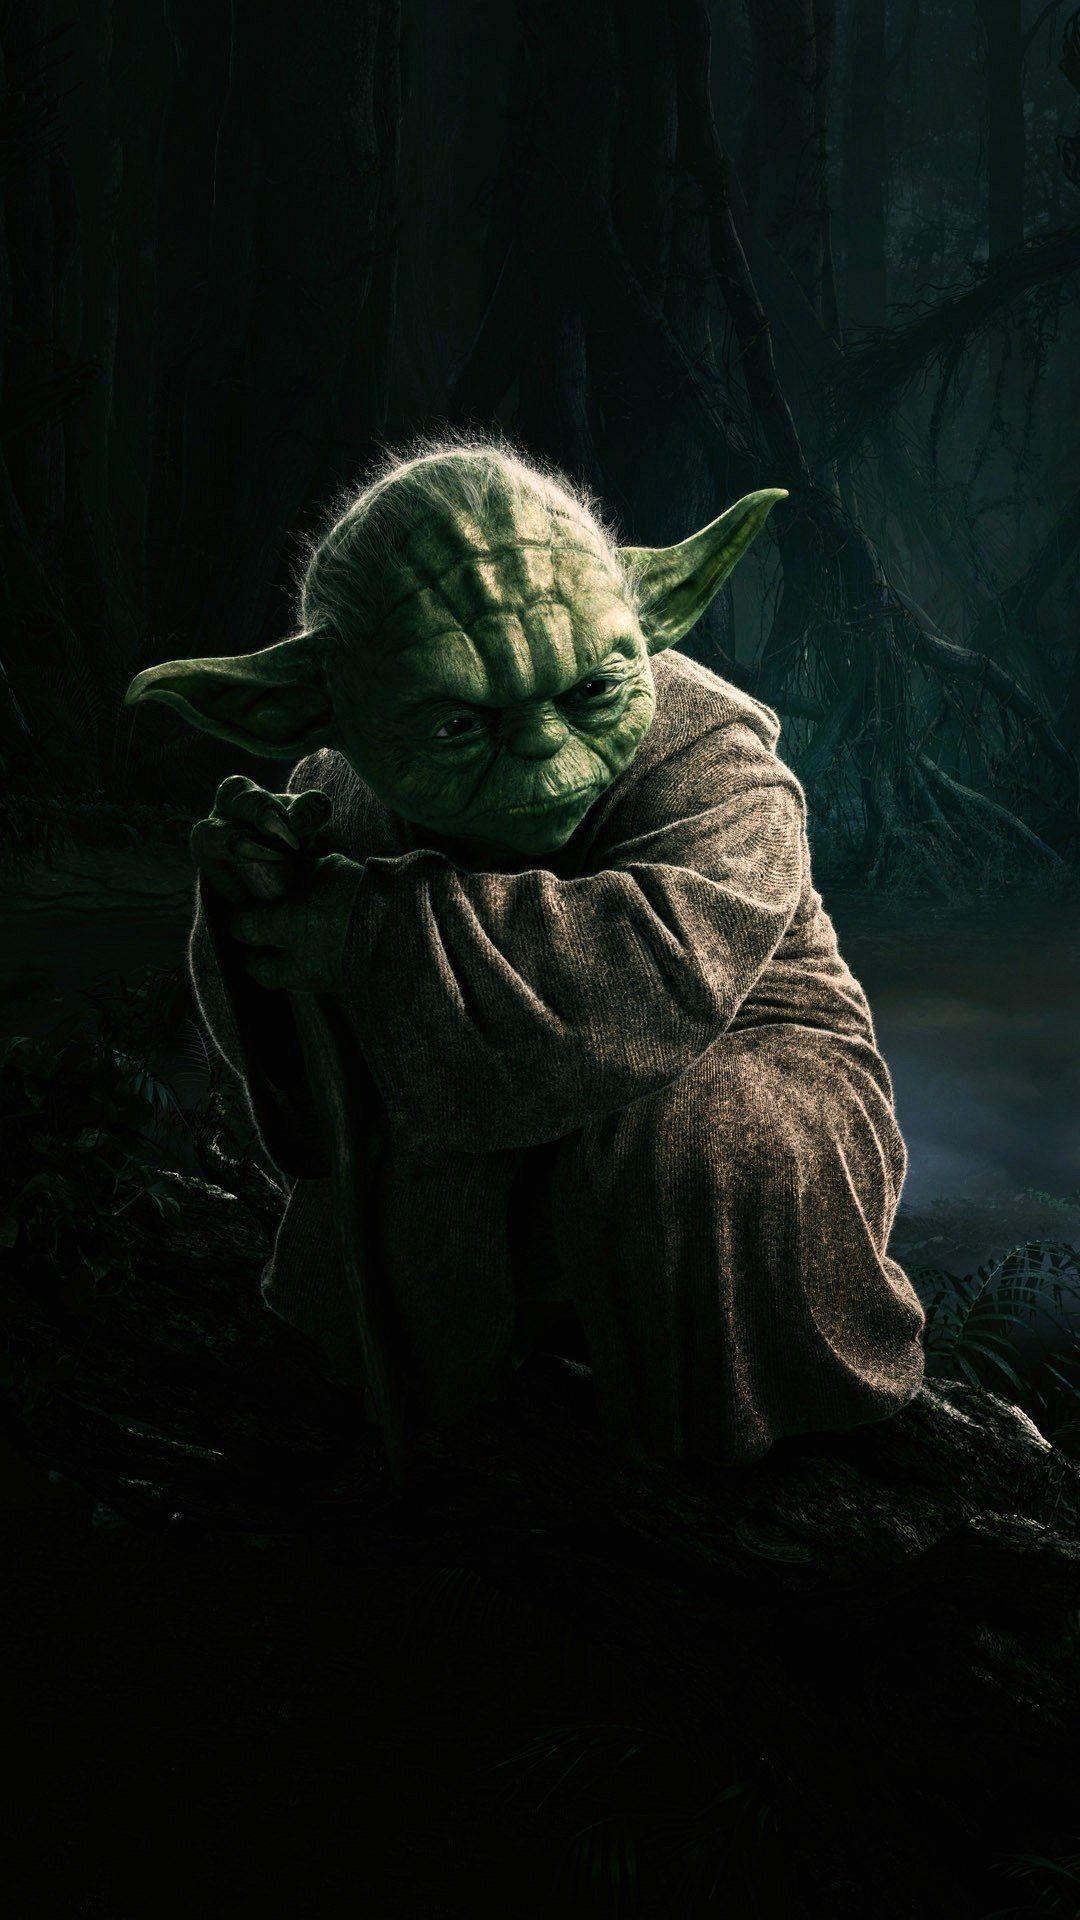 Star Wars HD Phone Wallpapers Top Free Star Wars HD Phone